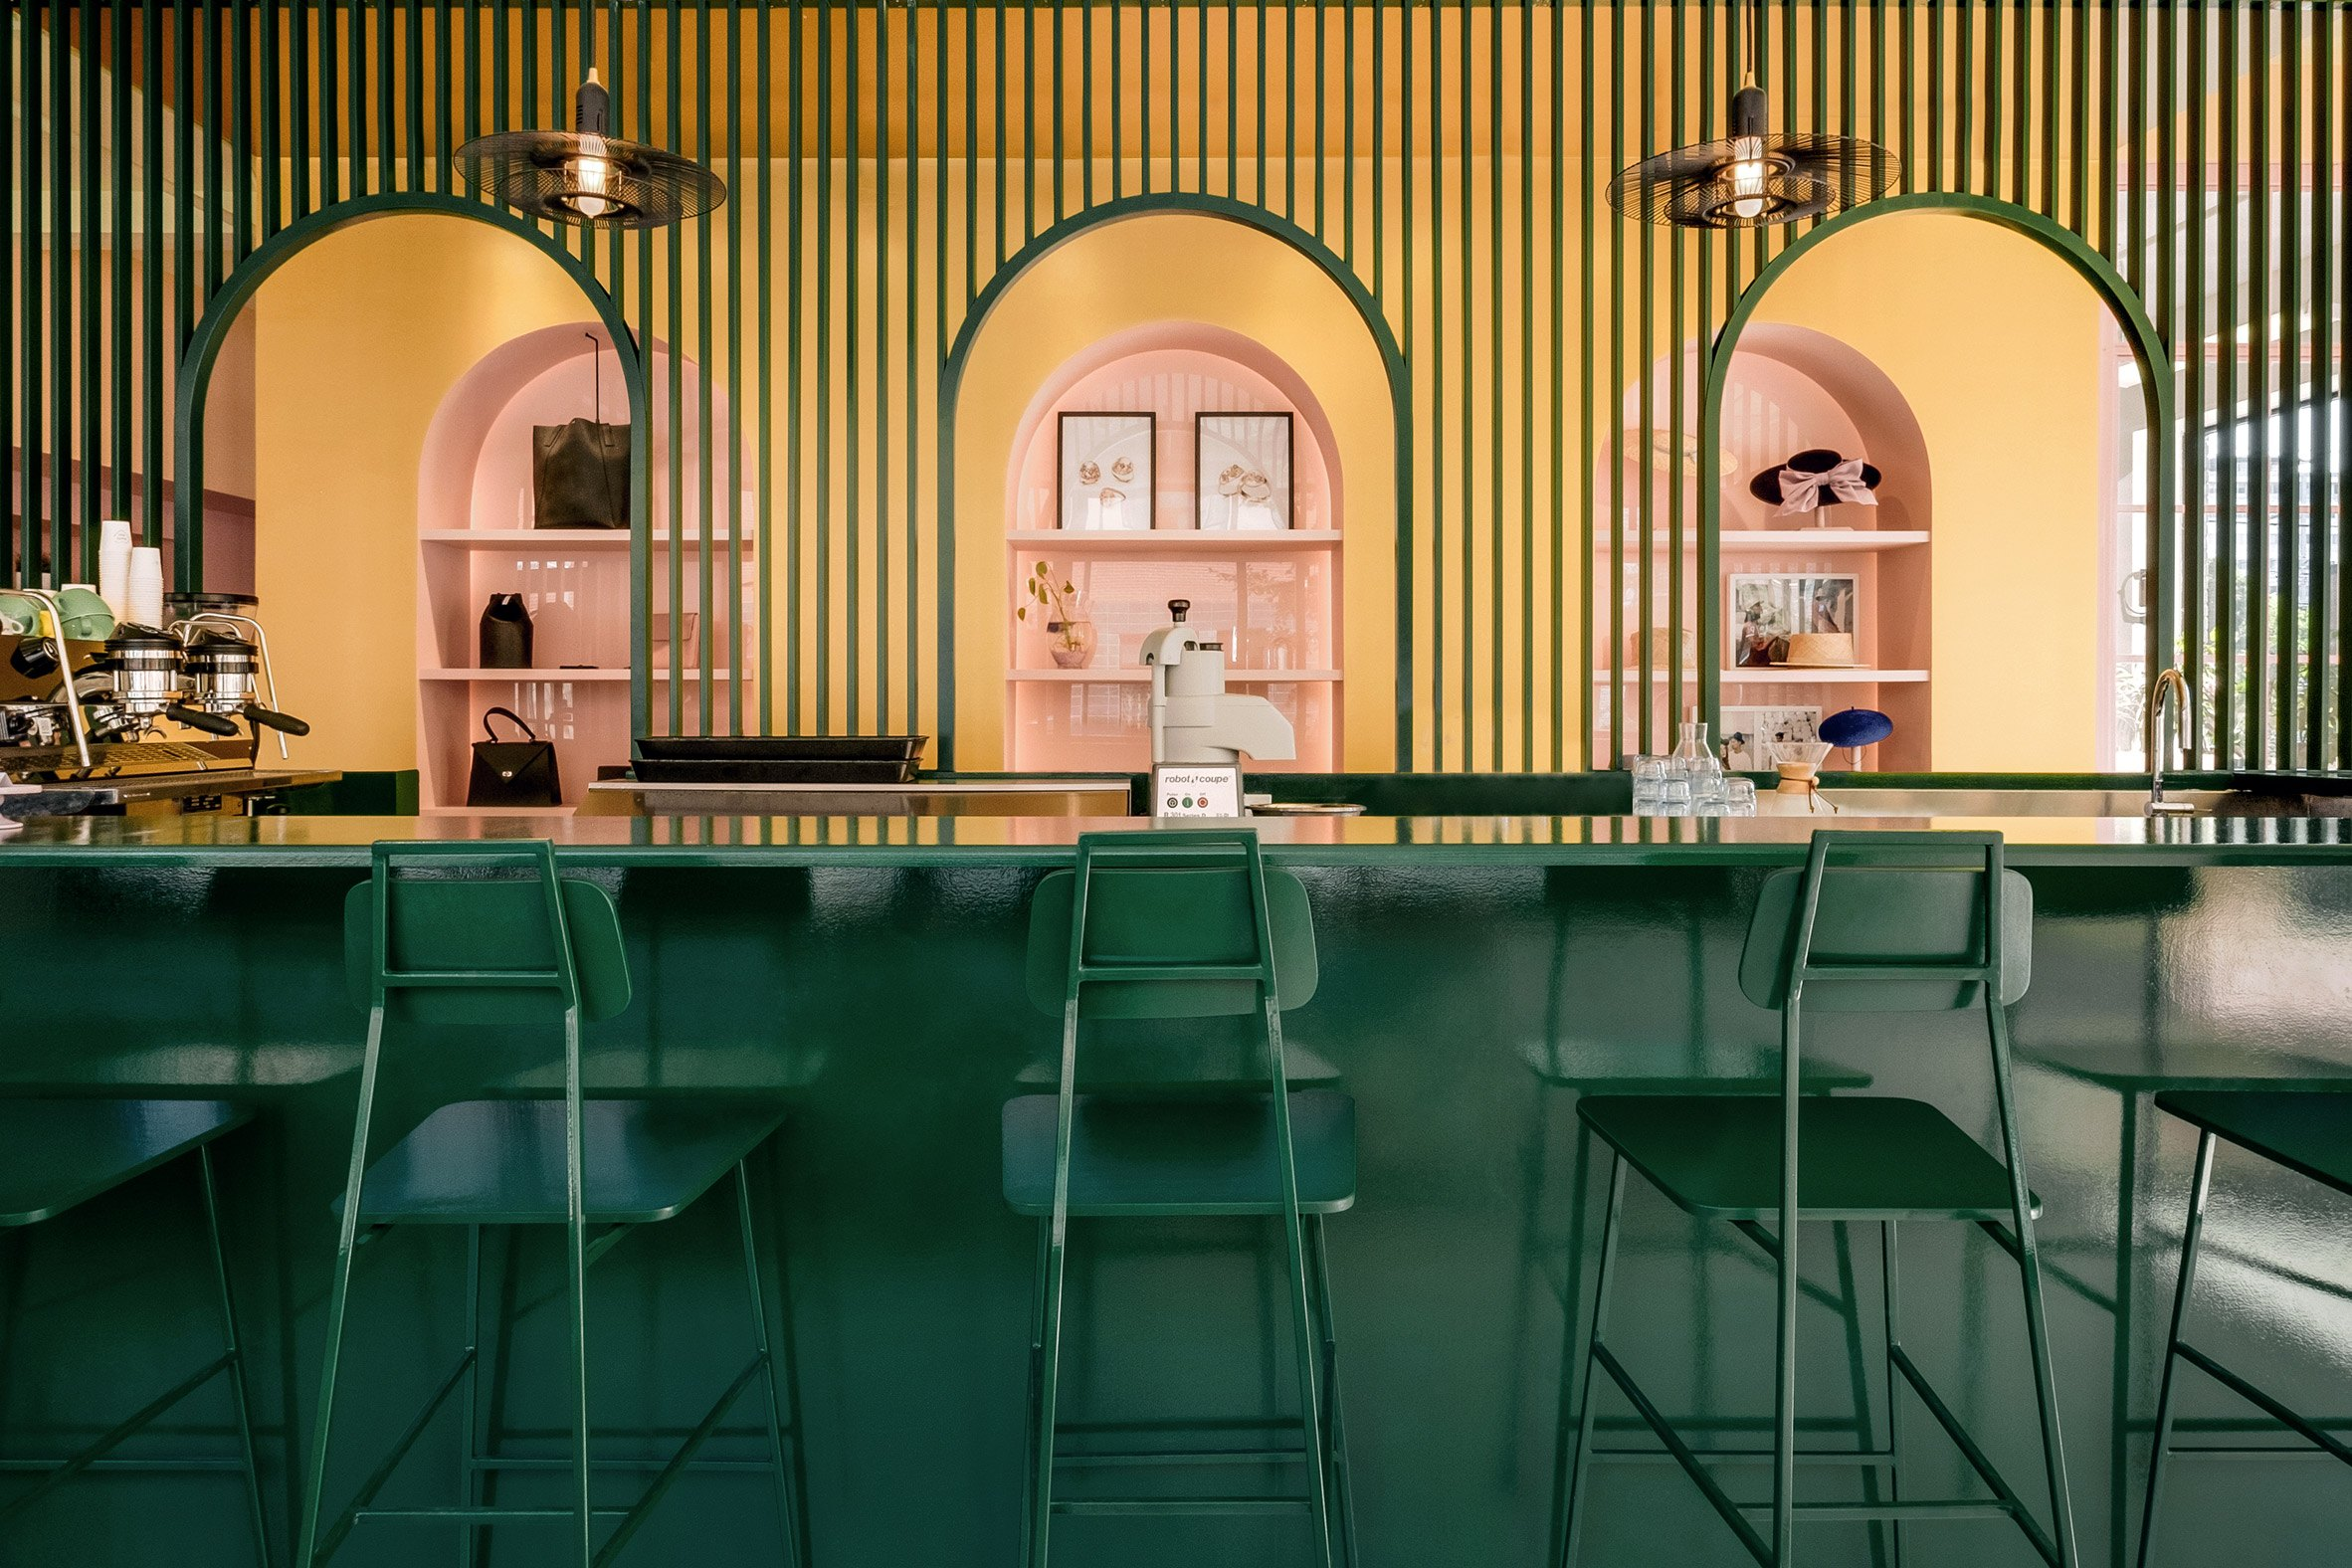 IGNANT-Architecture-Appareil-Architects-Pastel-Rita-Cafe-001